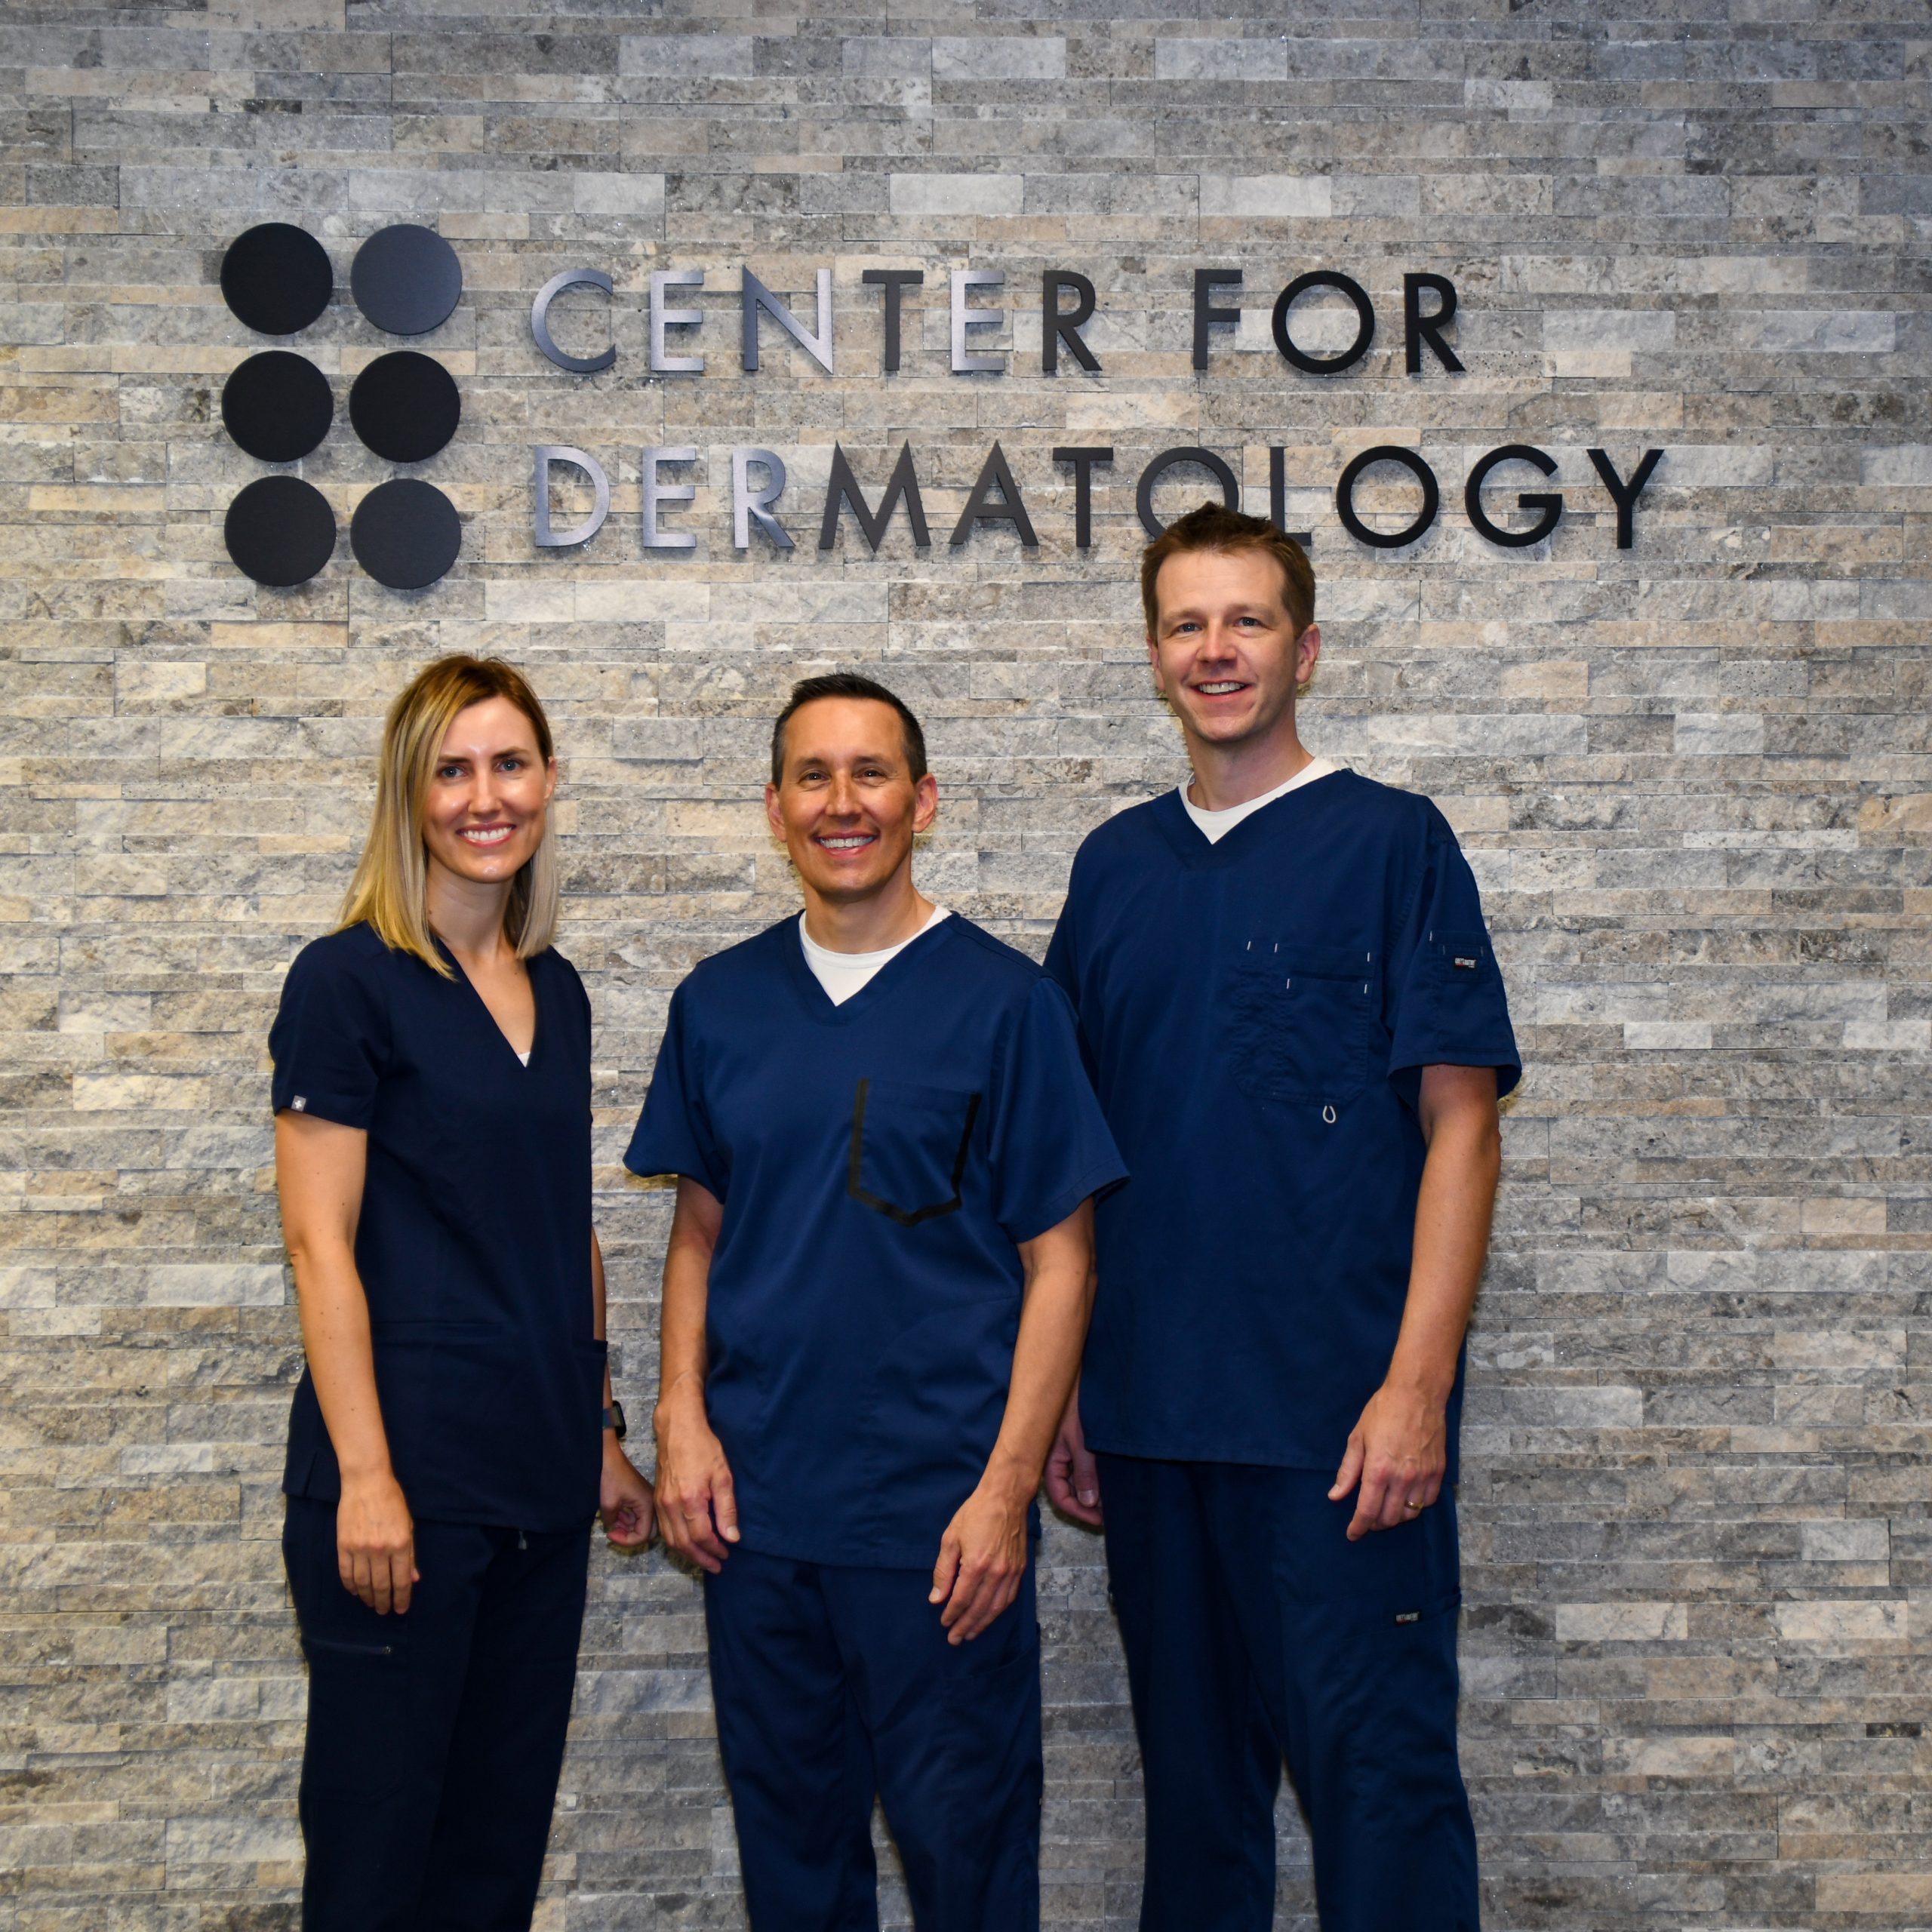 Center for Dermatology Celebrates 15-Year Anniversary